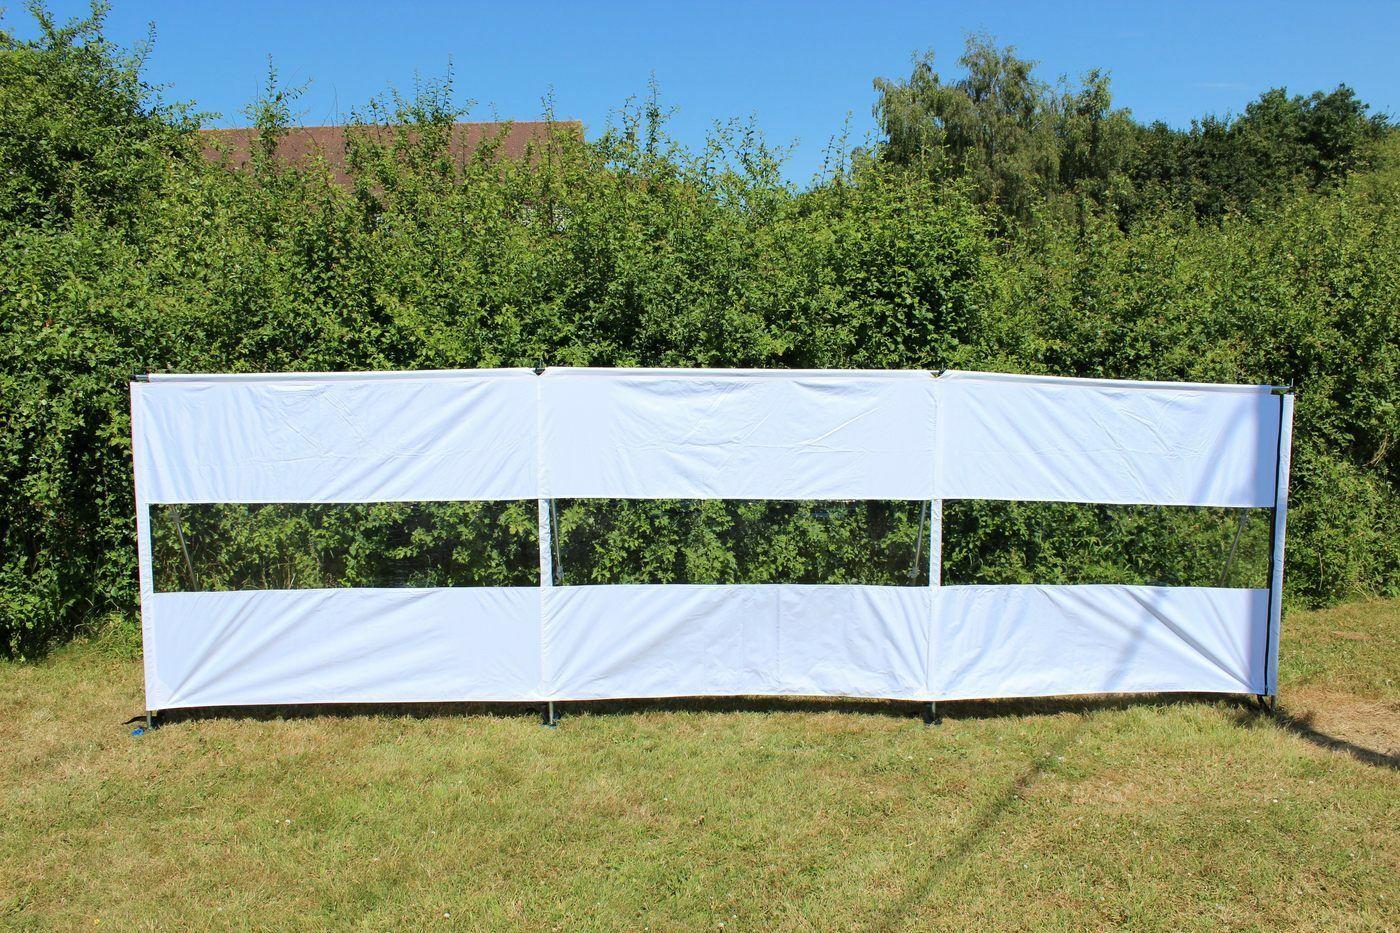 Compact Deluxe Panel Windbreak with steel poles - Free extra panel